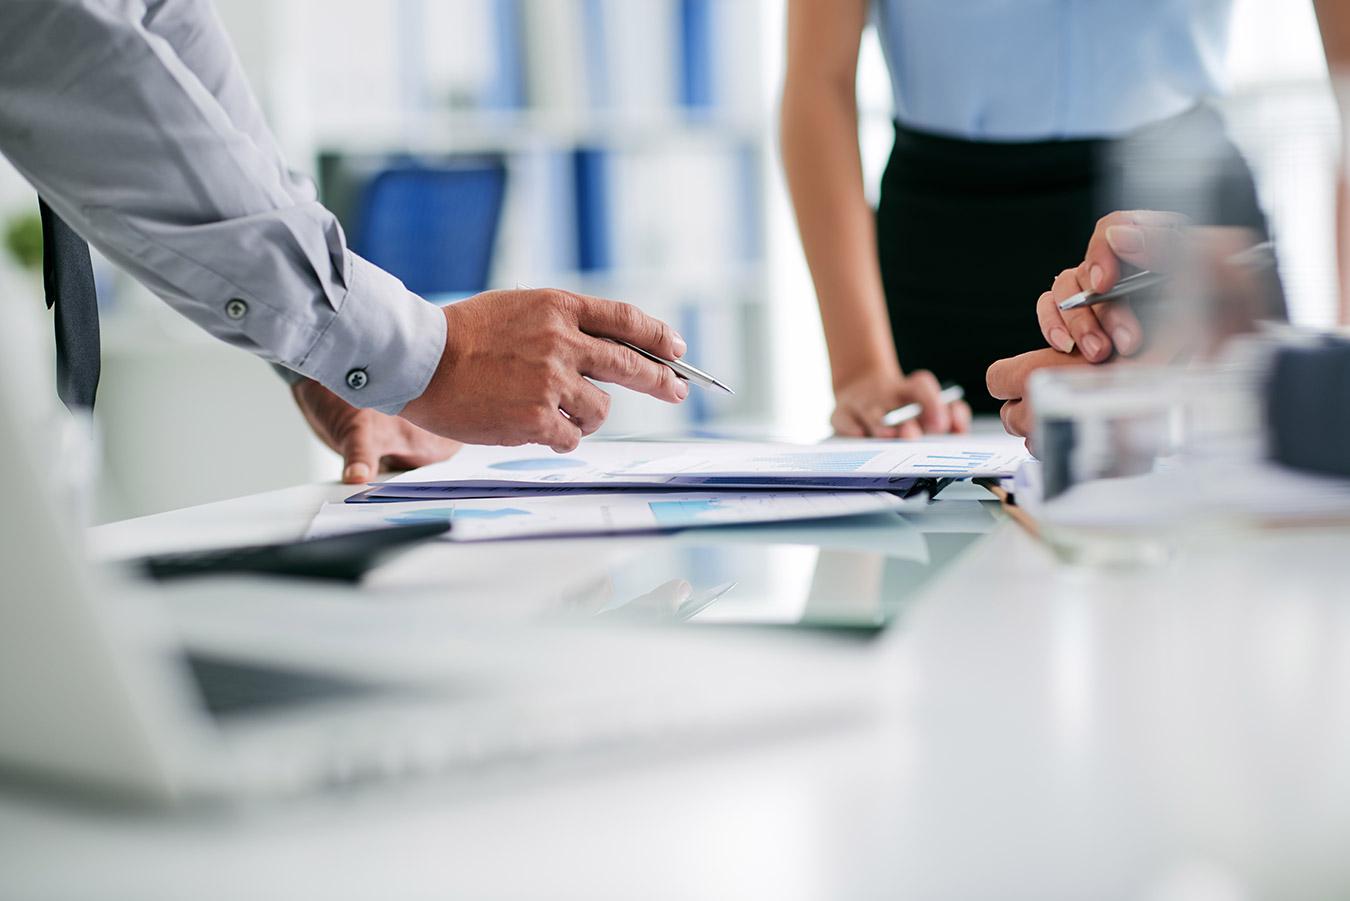 Create efficiencies and control costs